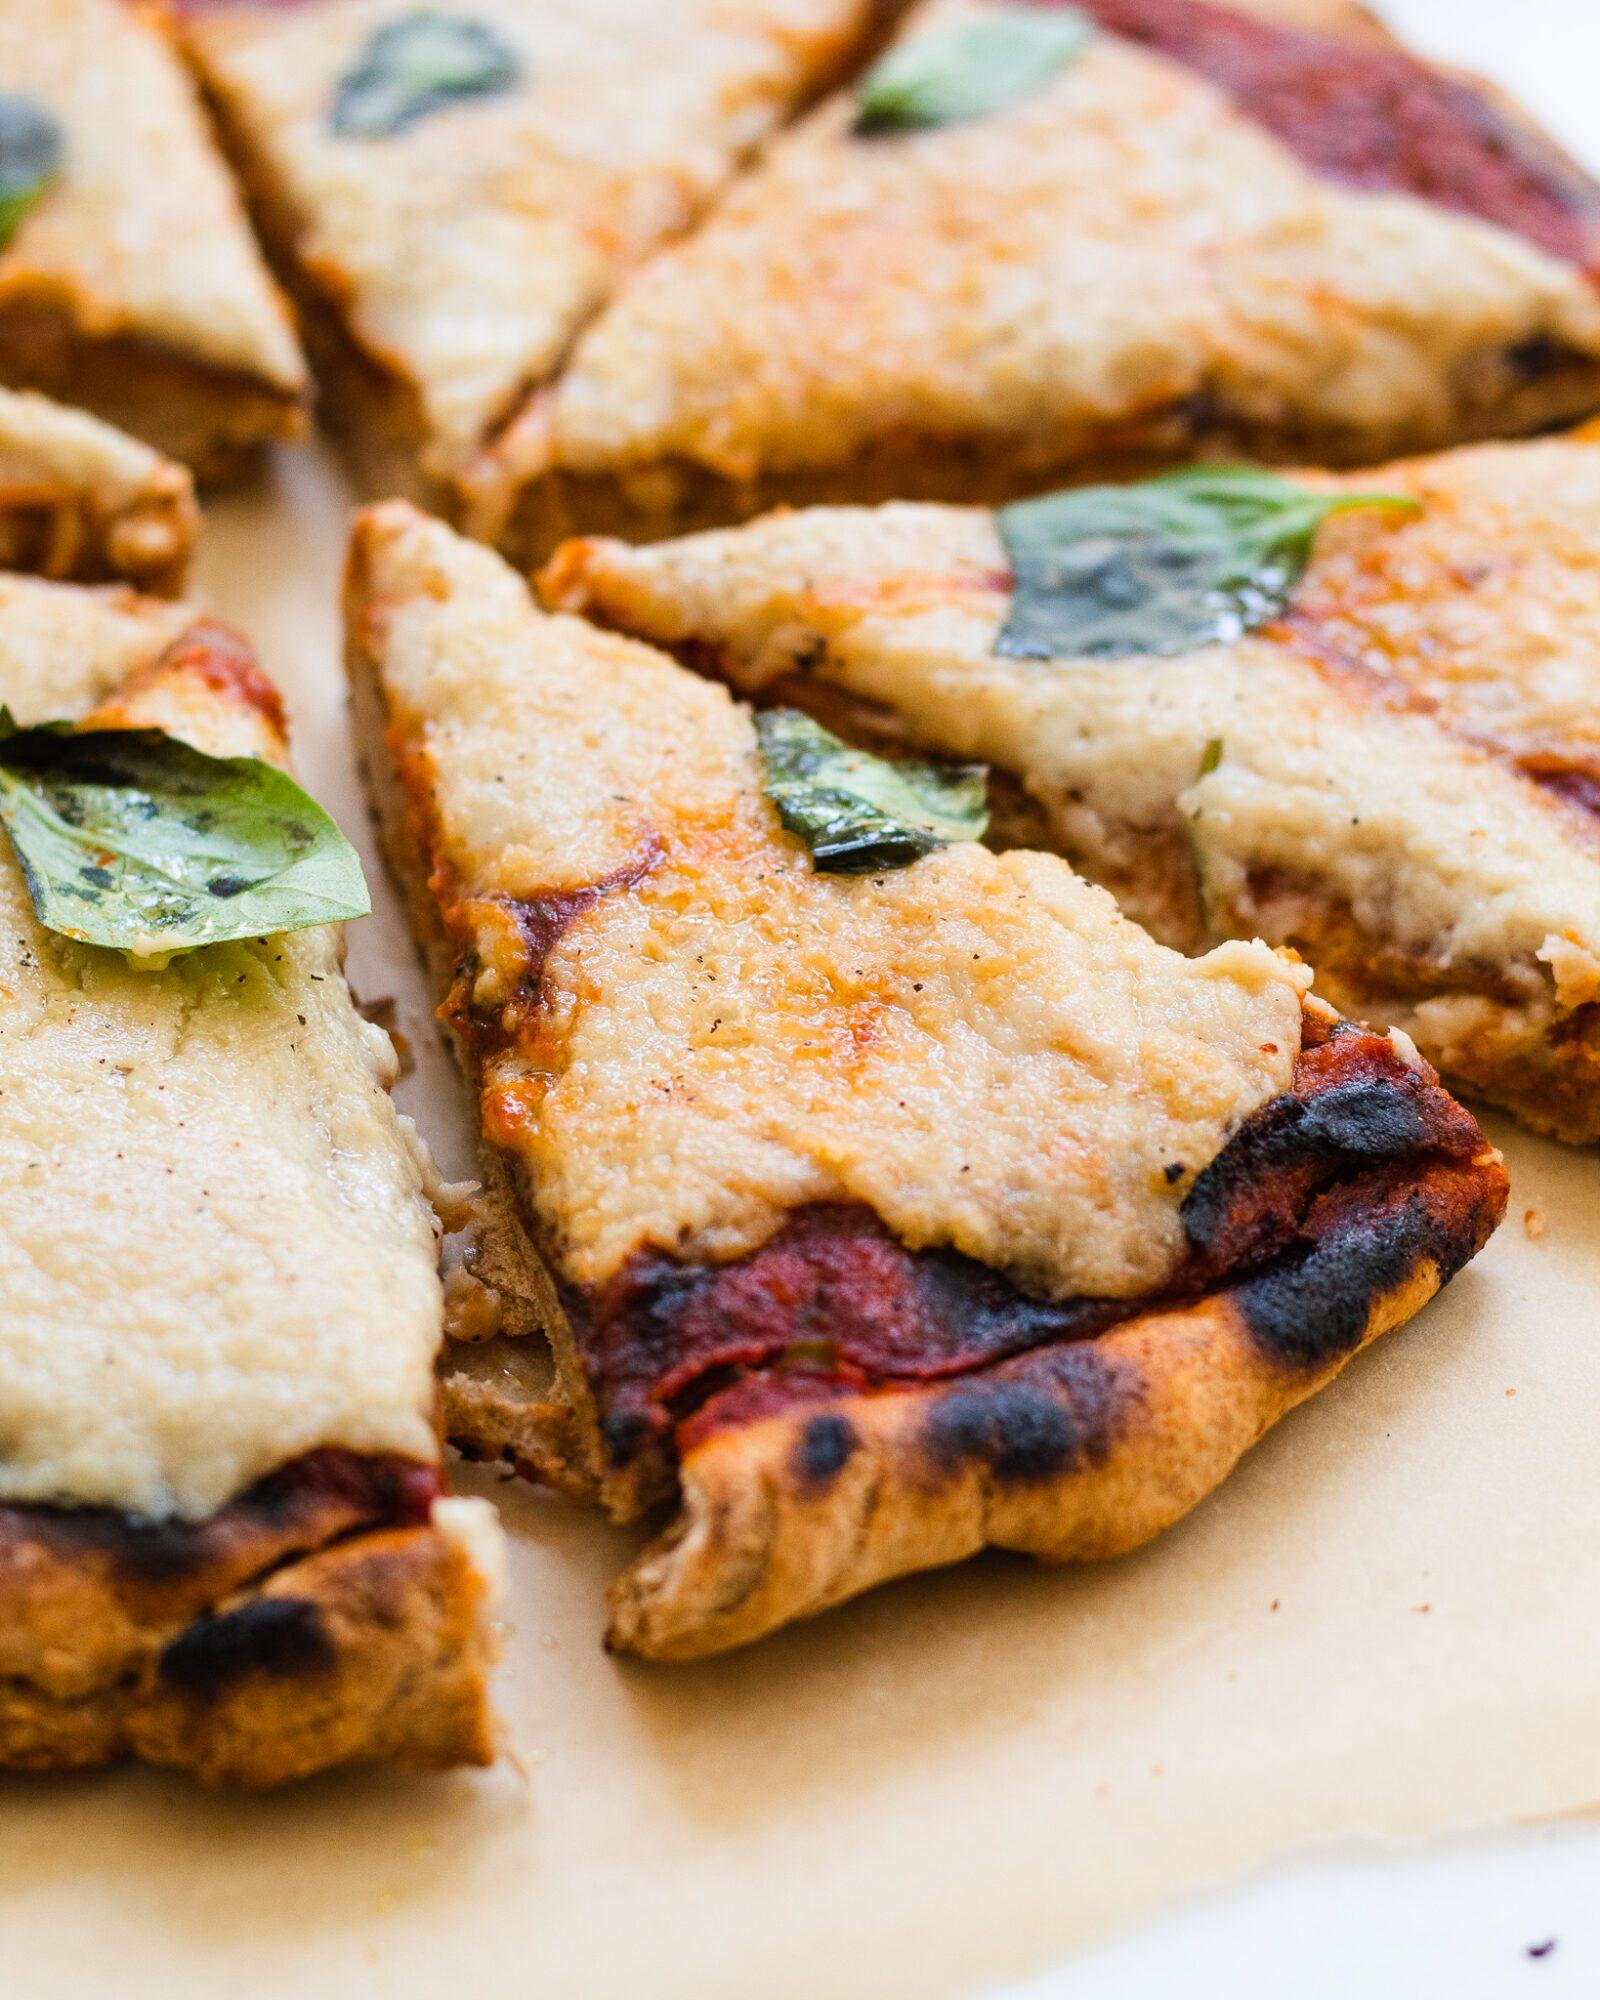 vegan pizza angled